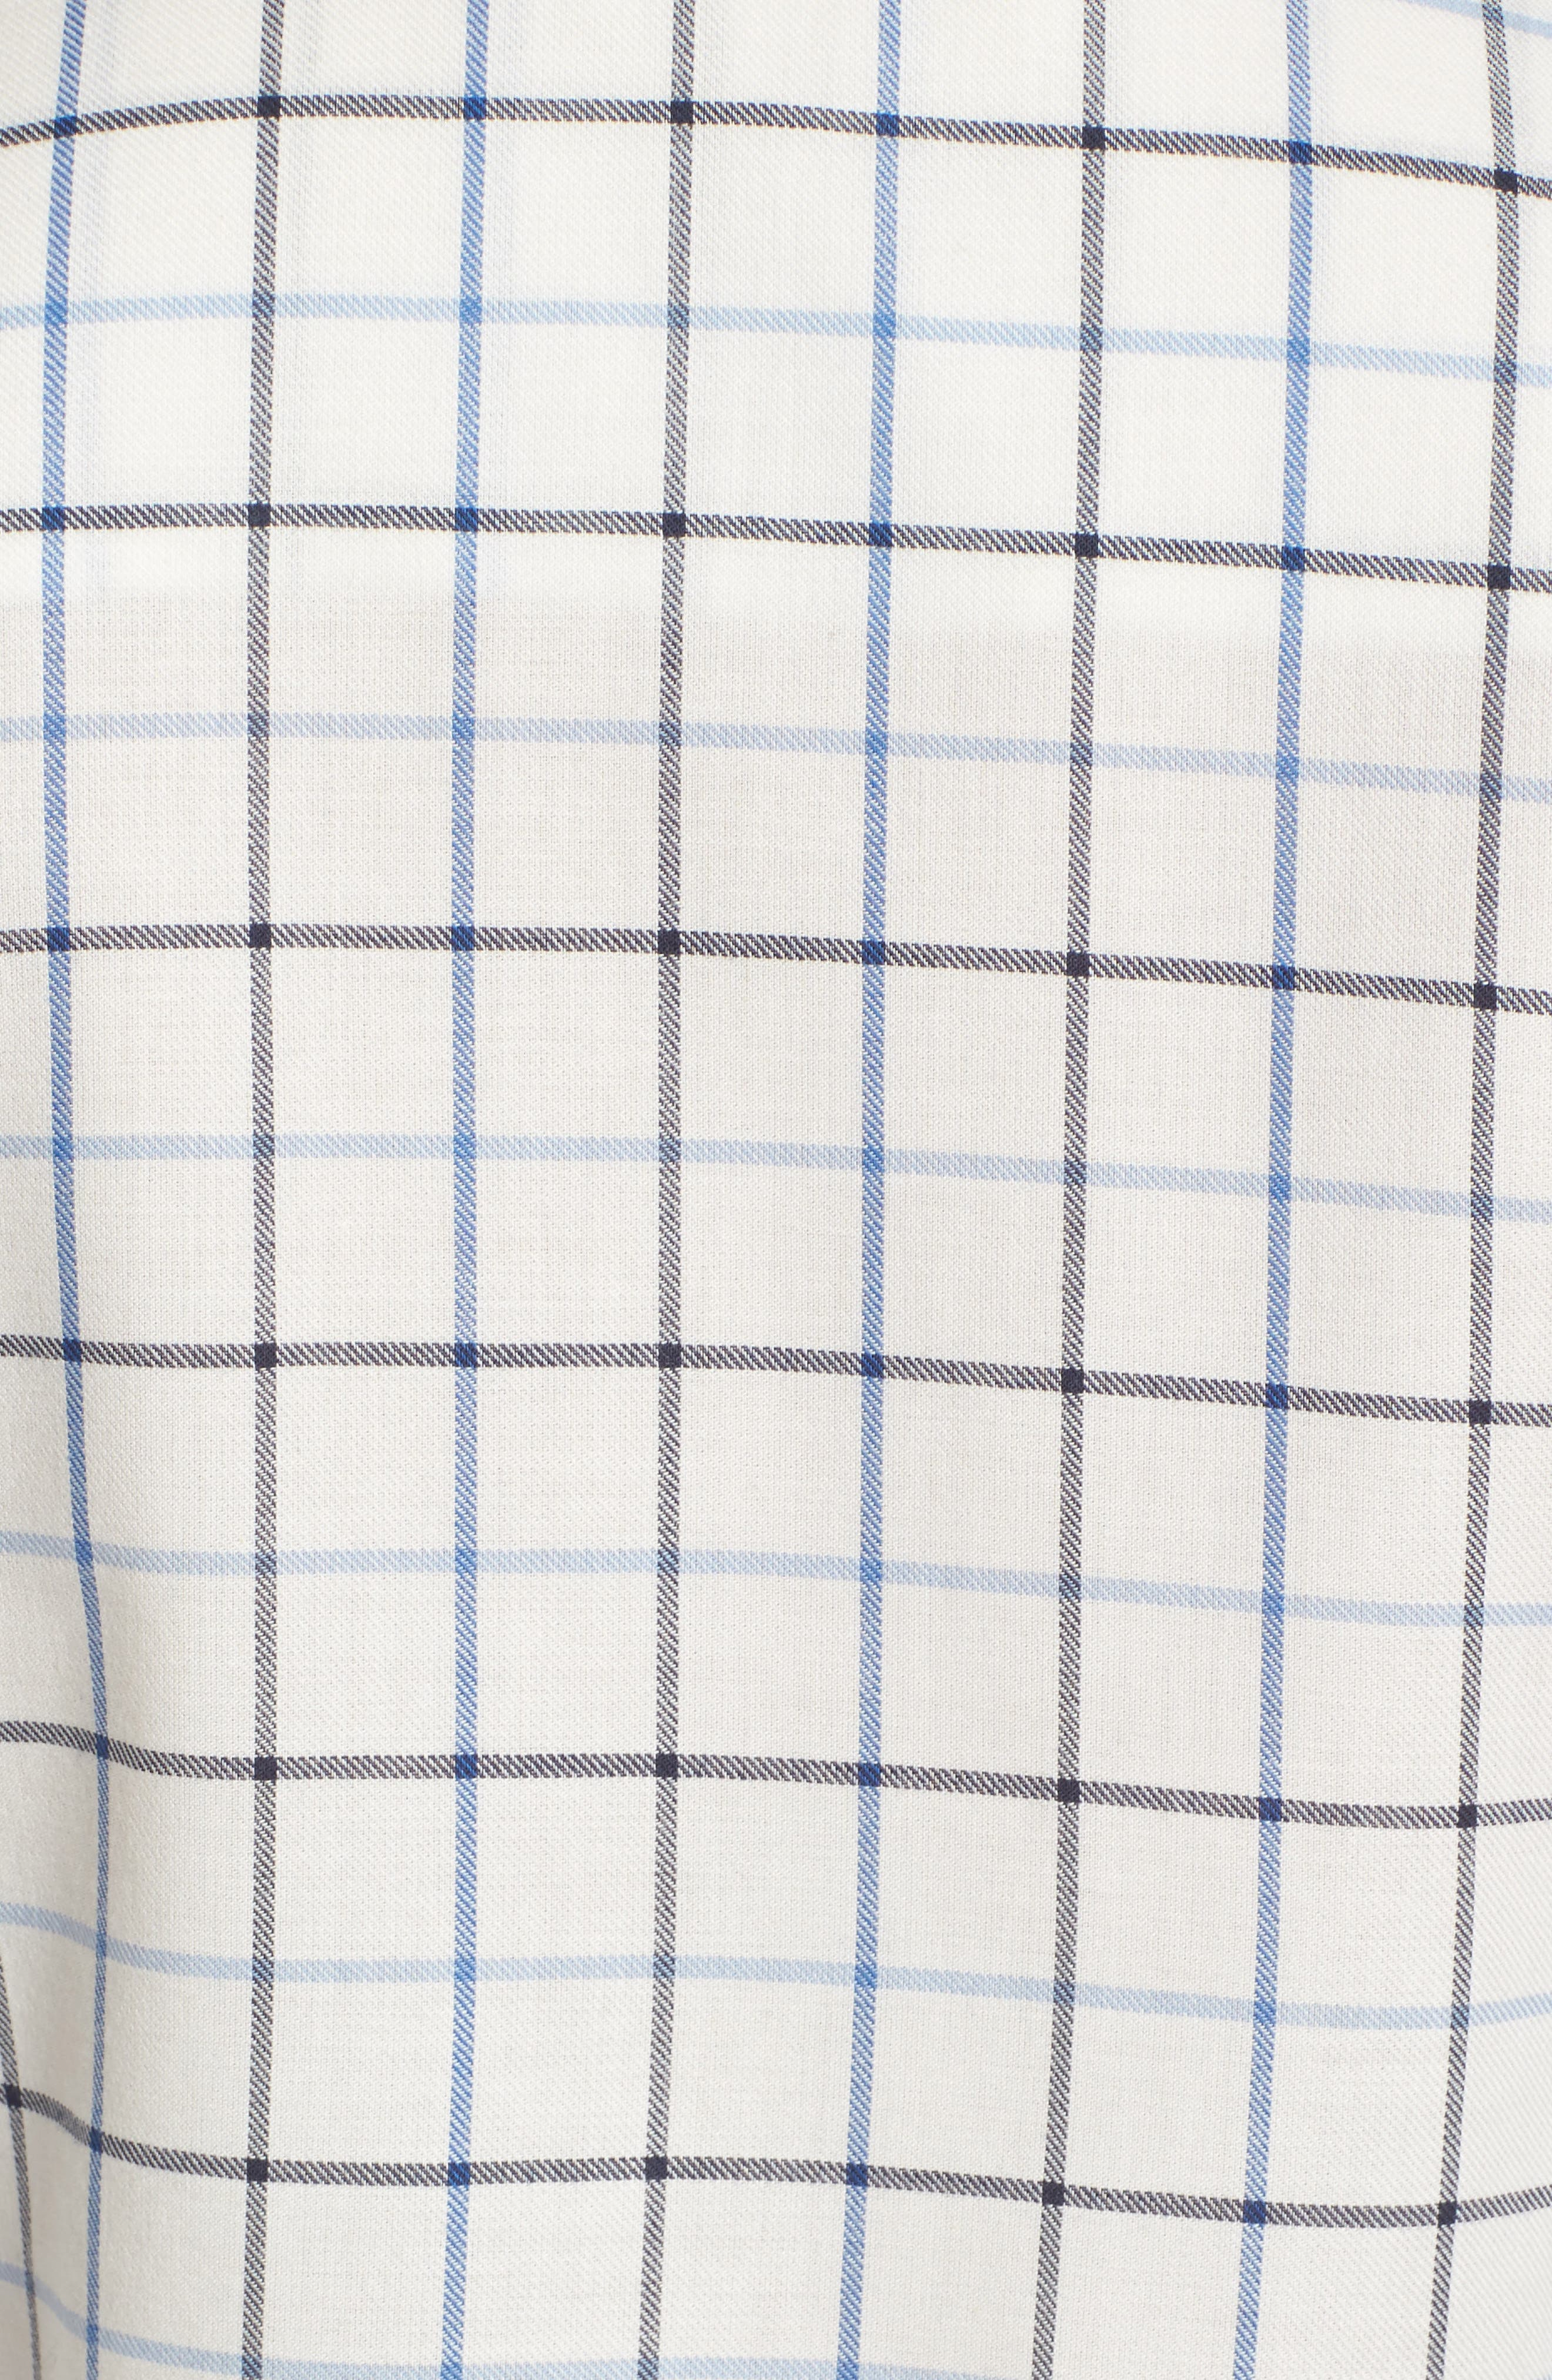 Triplebar Check Shirt,                             Alternate thumbnail 5, color,                             450